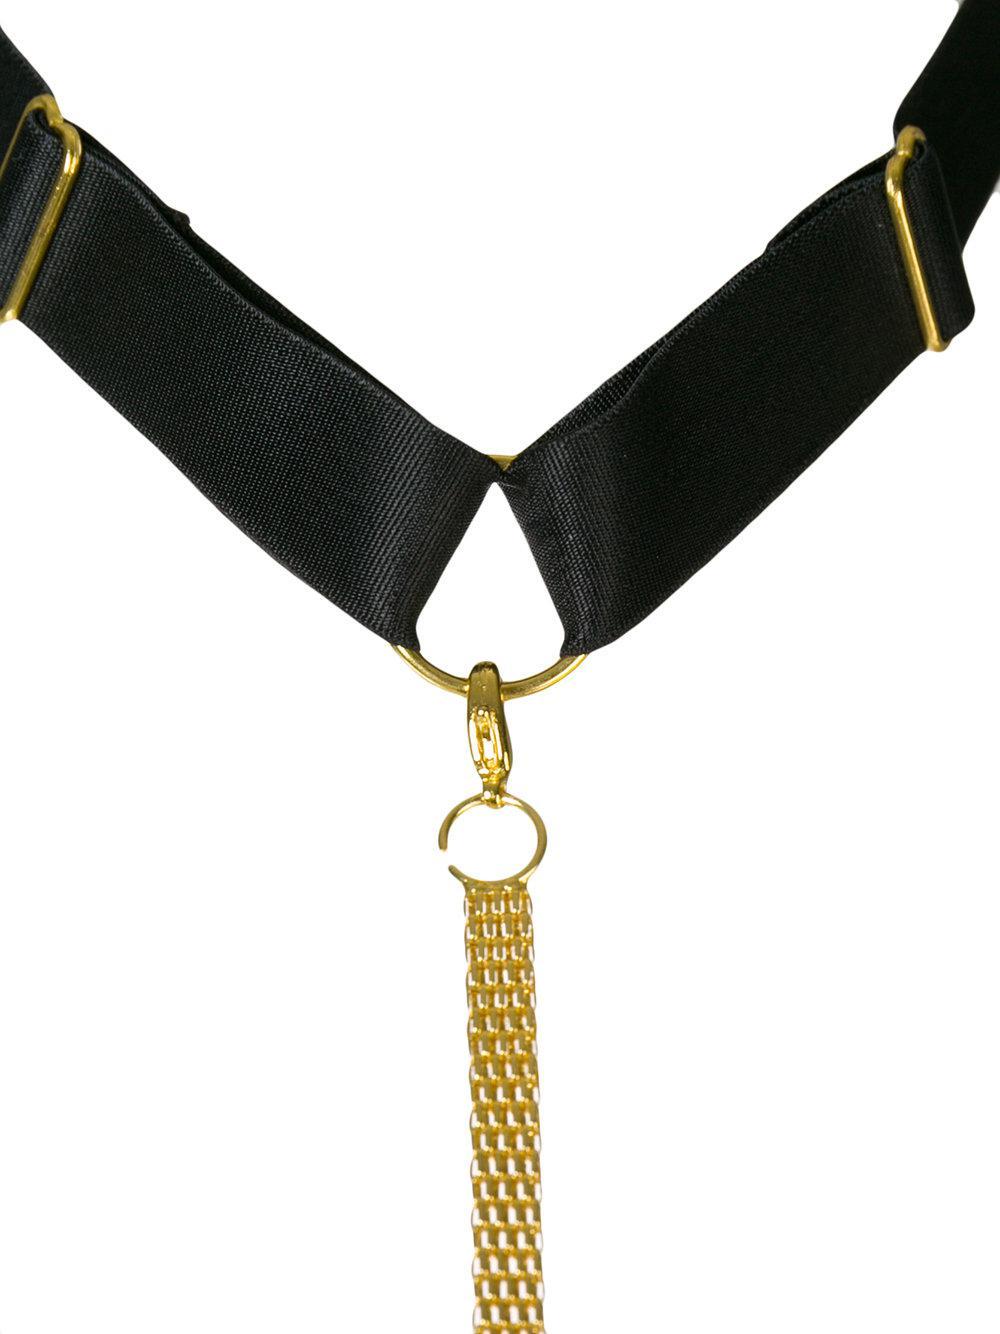 Tapage Nocturne Plastron harness - Black Maison Close Release Dates For Sale g3Ajj